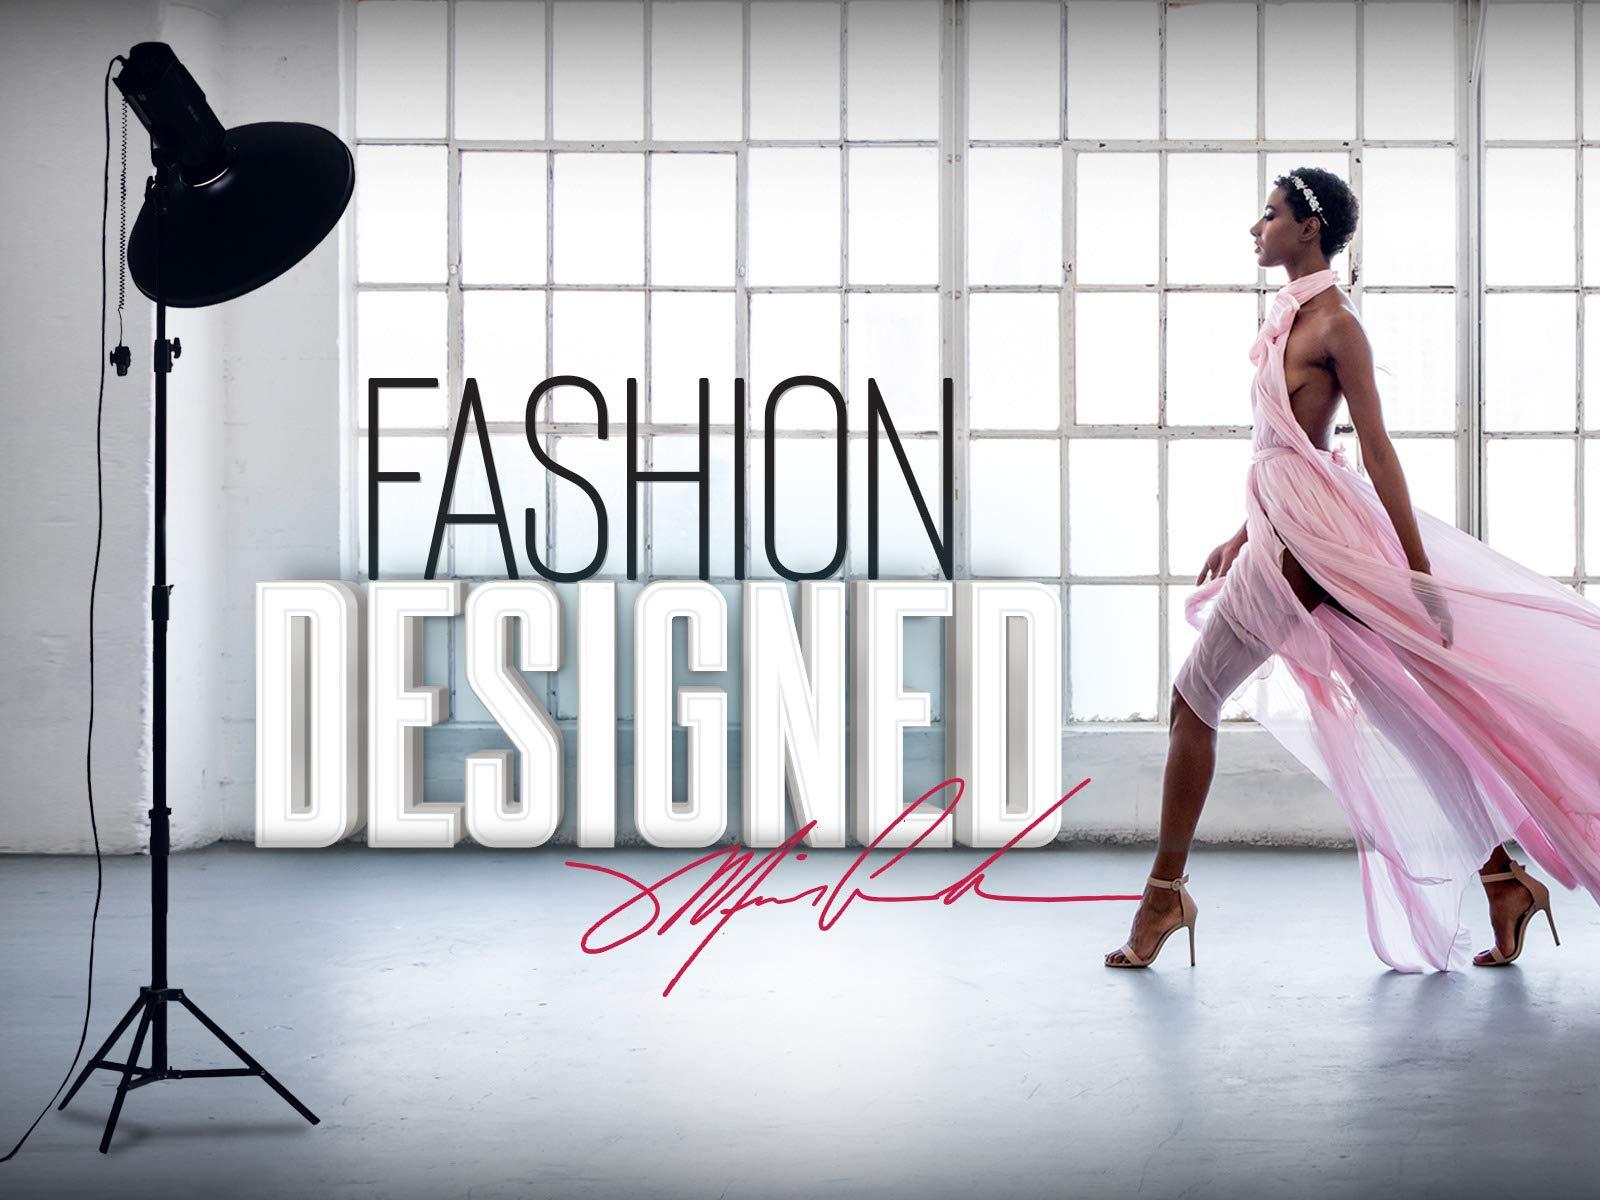 Fashion Designed - Season 1